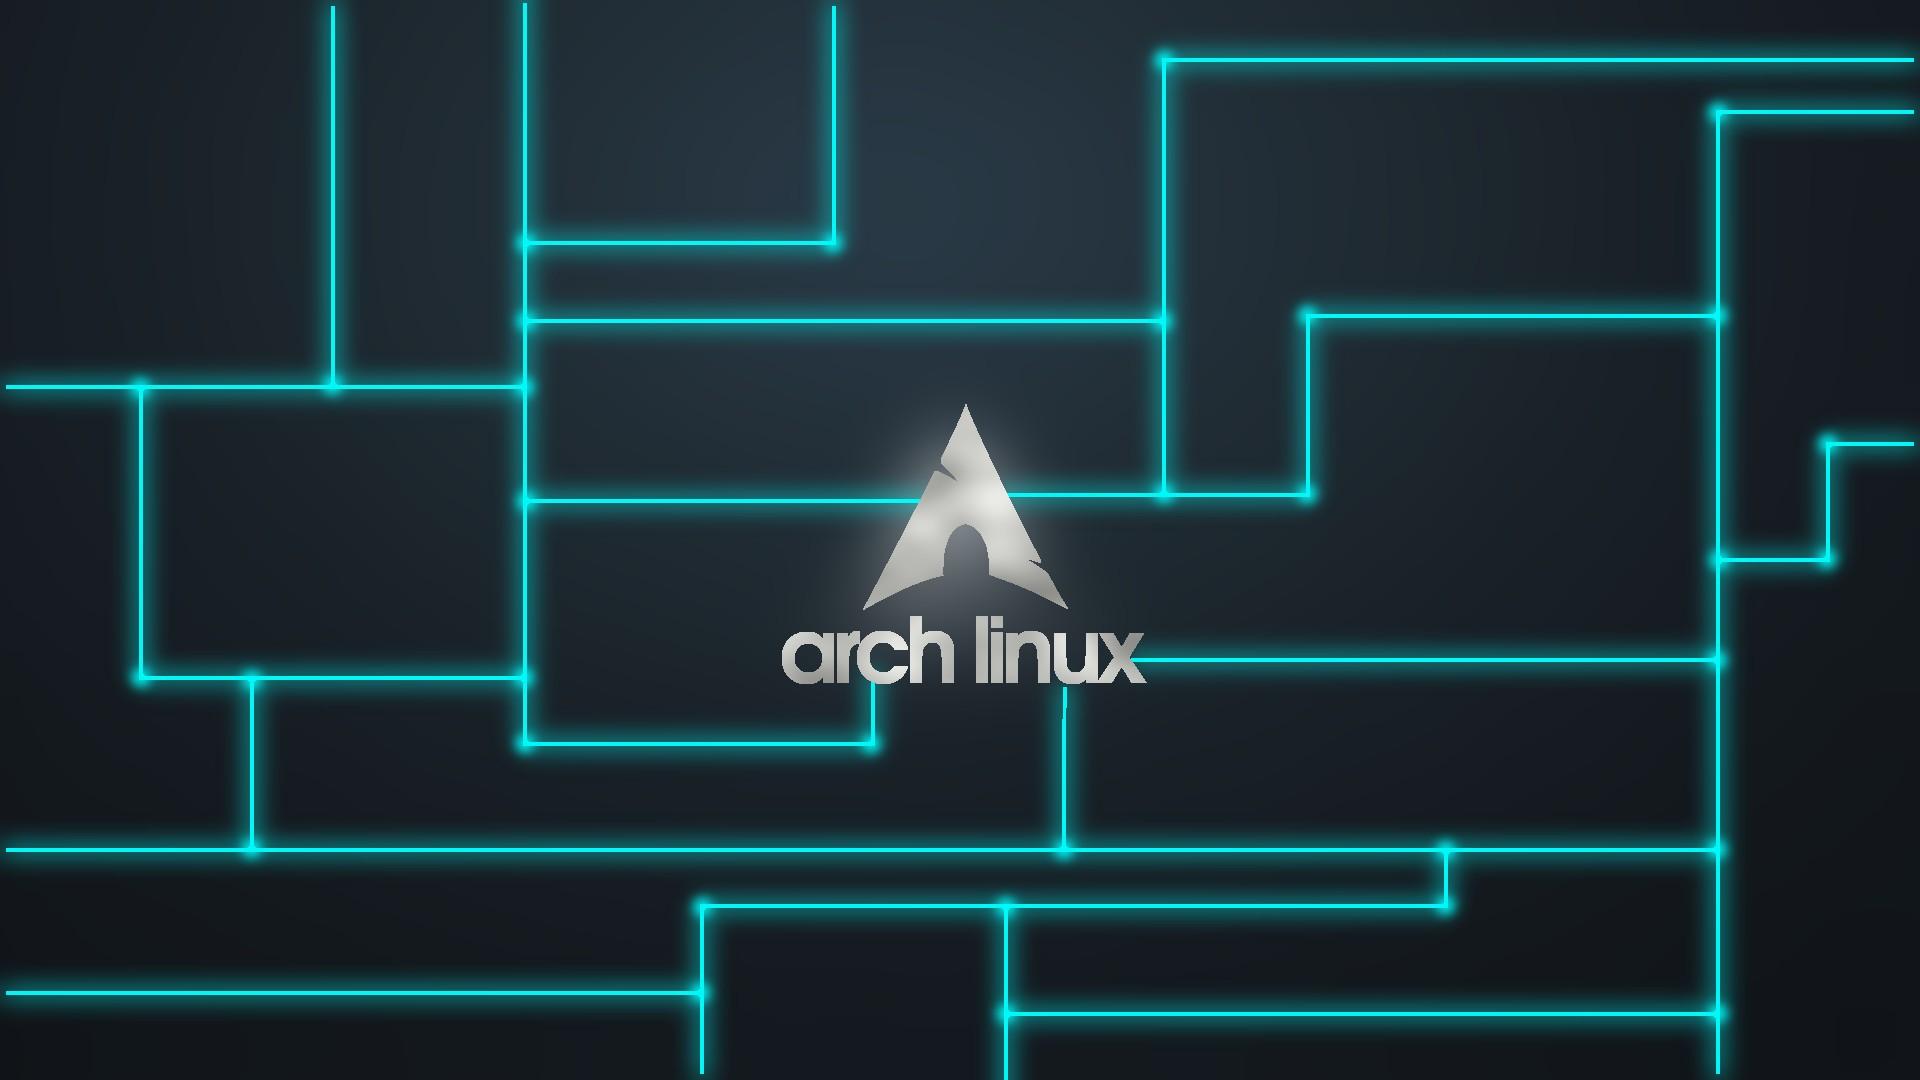 Arch Linux Wallpaper 14 - [1920x1080]